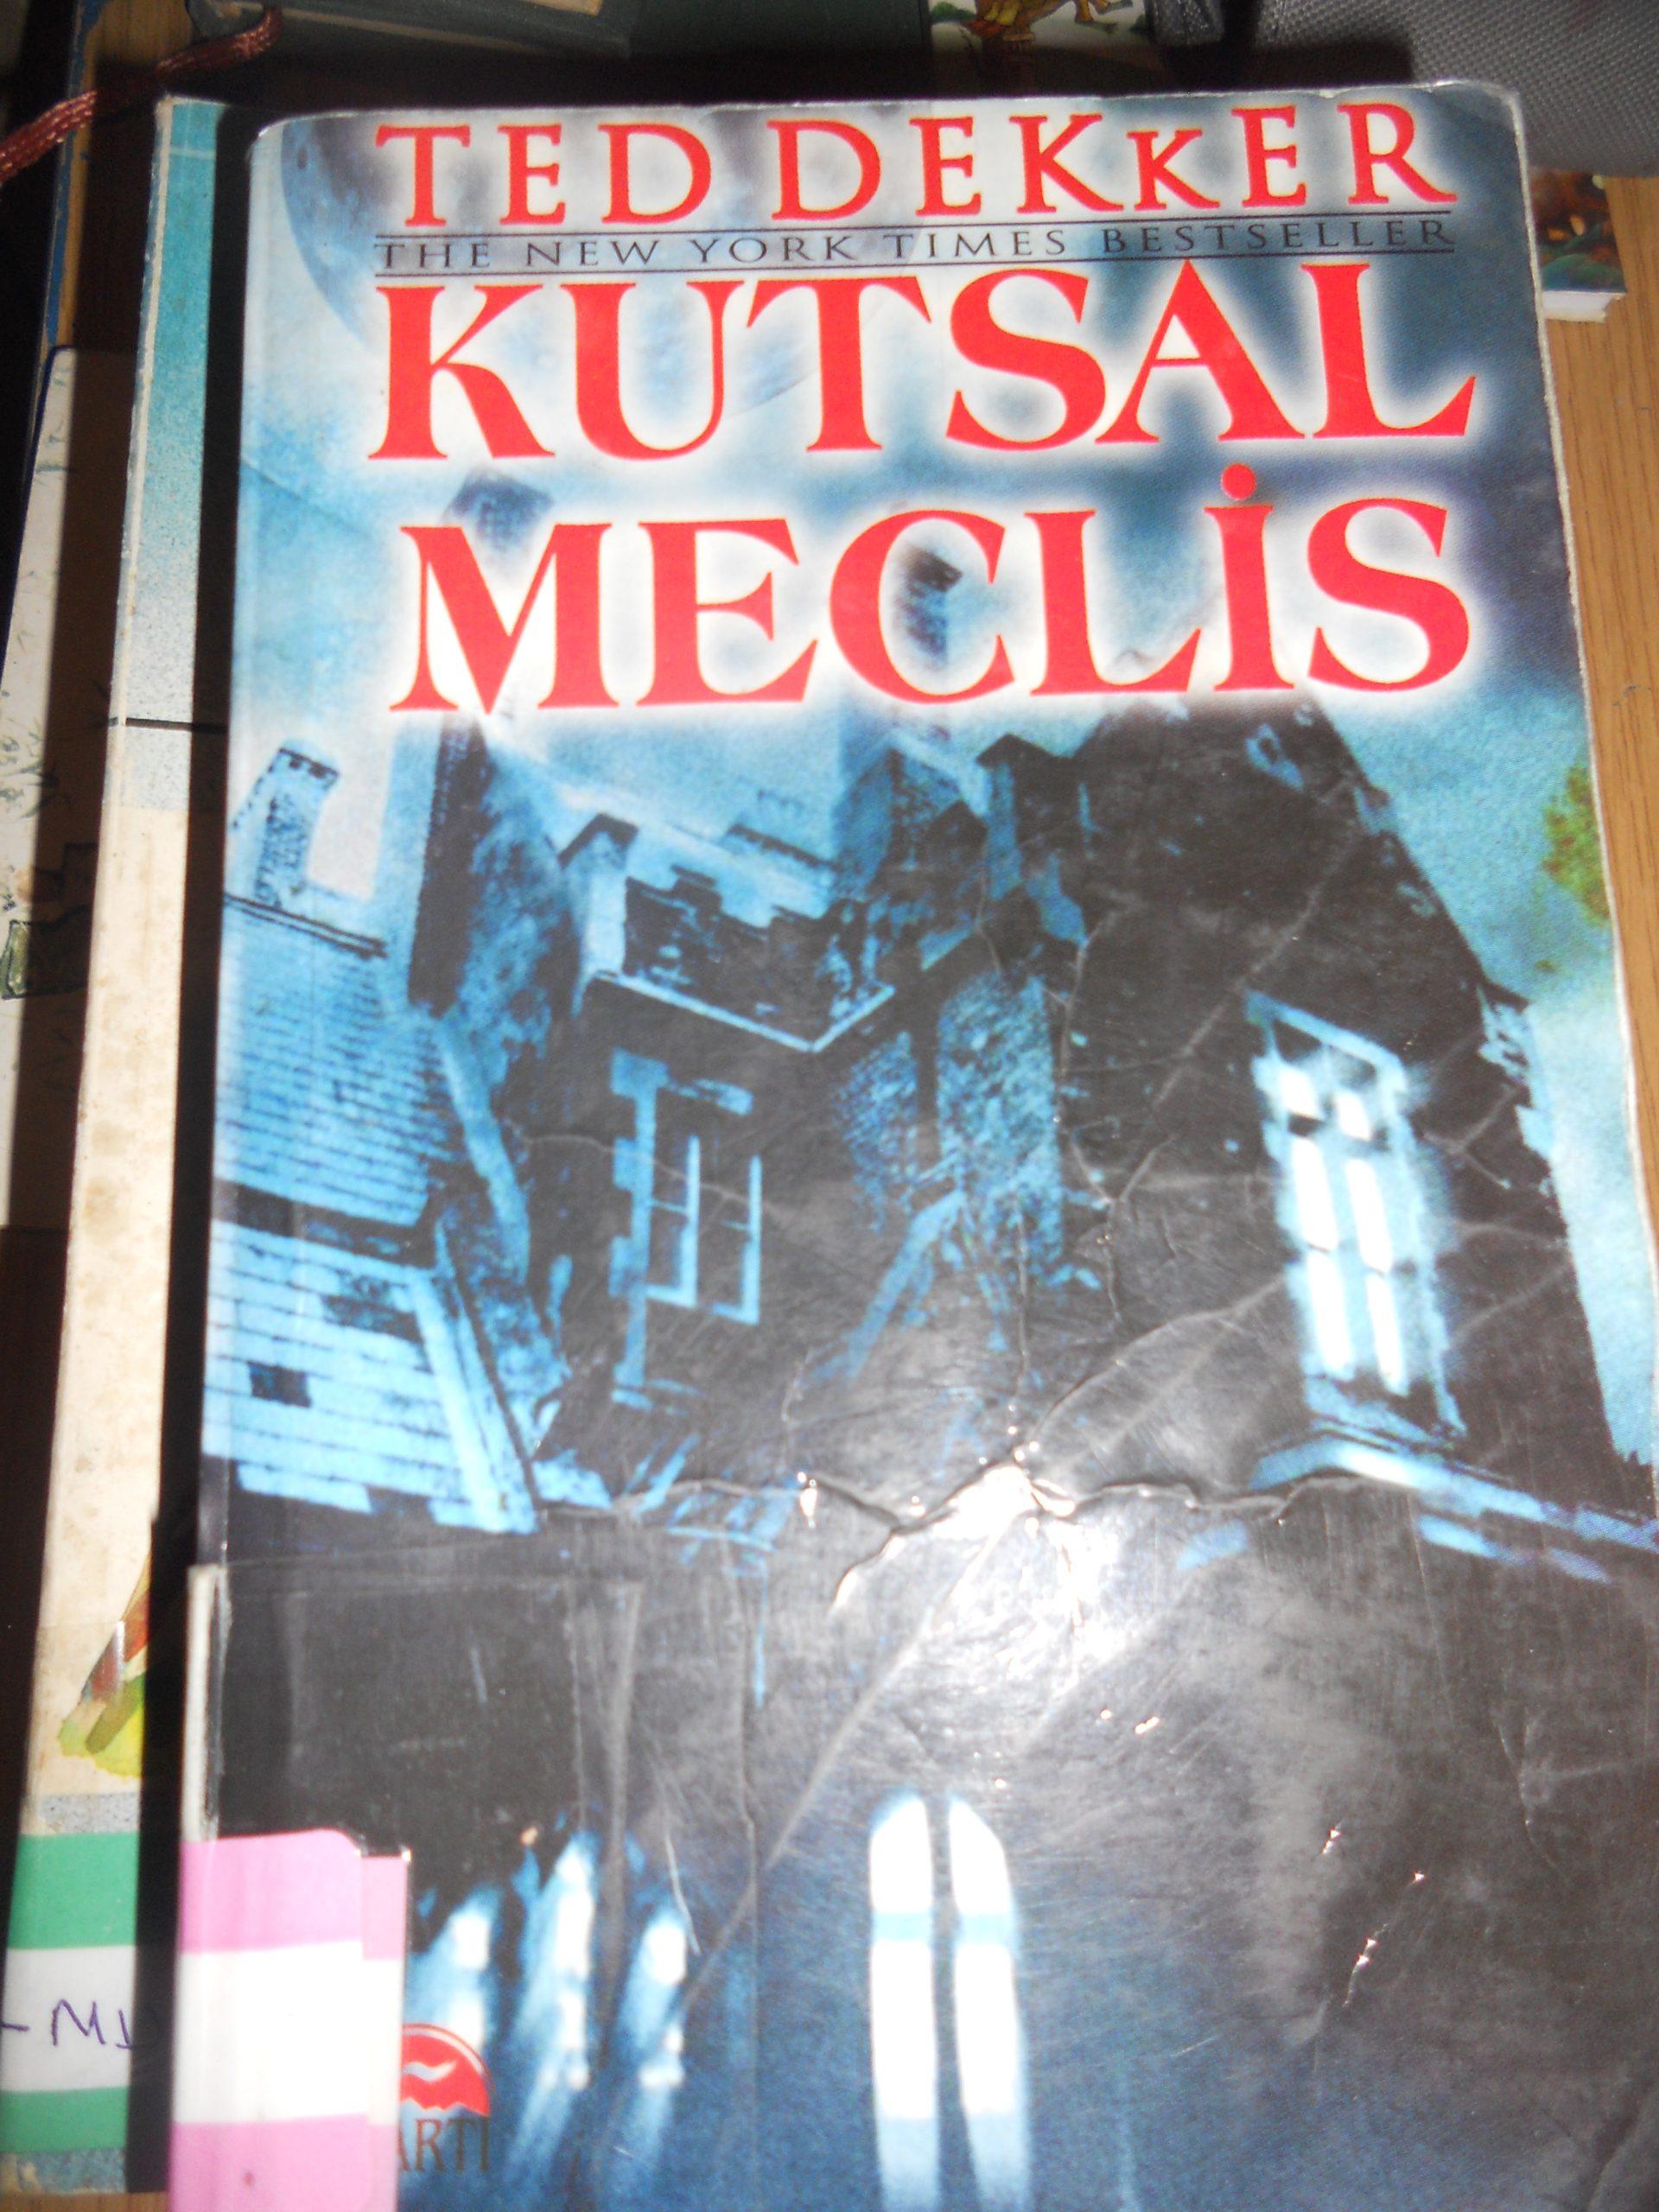 KUTSAL MECLİS/ Ted DEKKER/10 TL